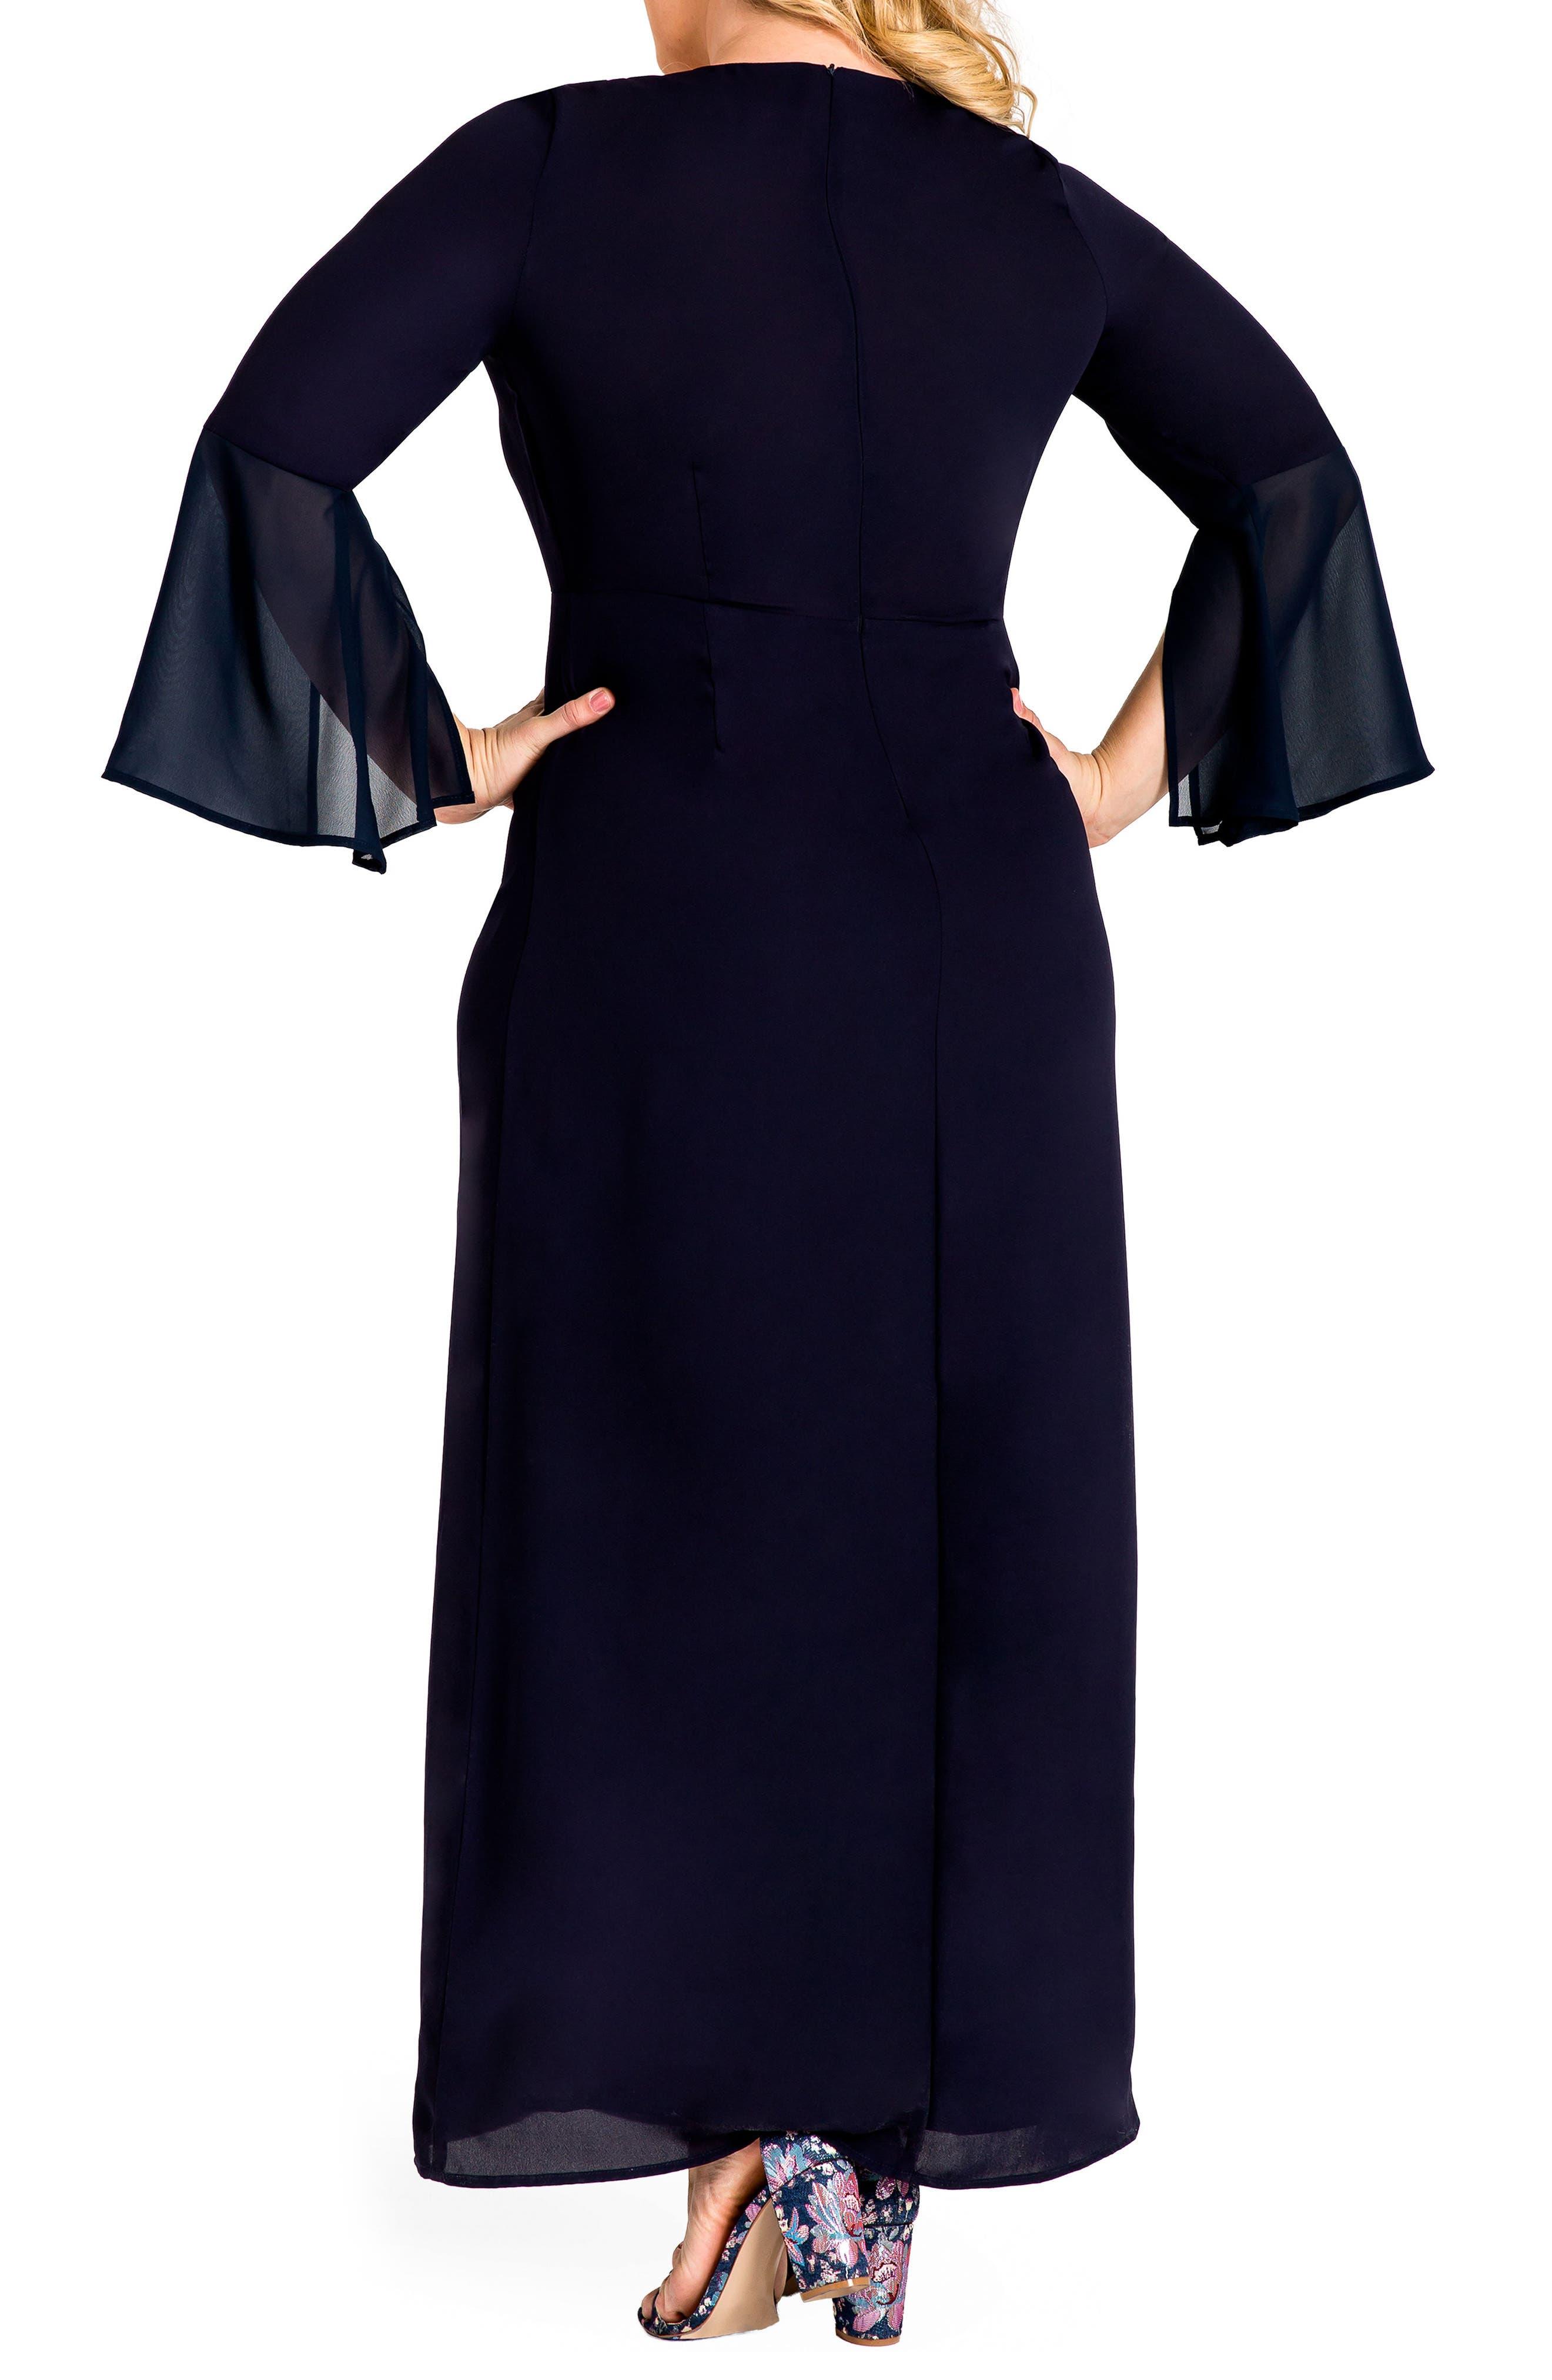 Norah Maxi Dress,                             Alternate thumbnail 2, color,                             Navy